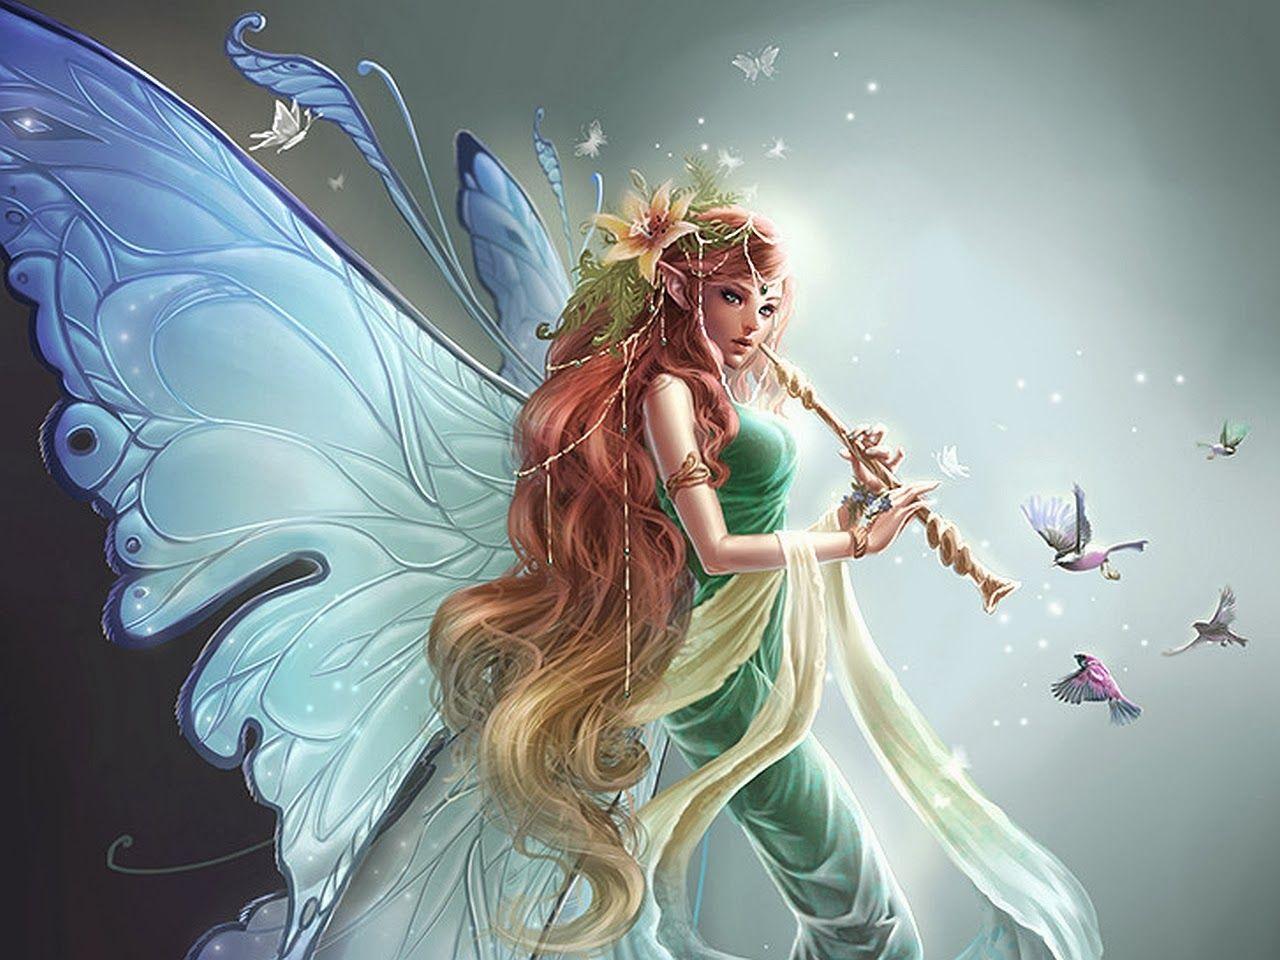 Beautiful Fantasy Fairy Hd Wallpapers Deep Hd Wallpapers For You Hd Wallpapers 1080p Free Desktop Fairy Wallpaper Fantasy Fairy Fairy Artwork